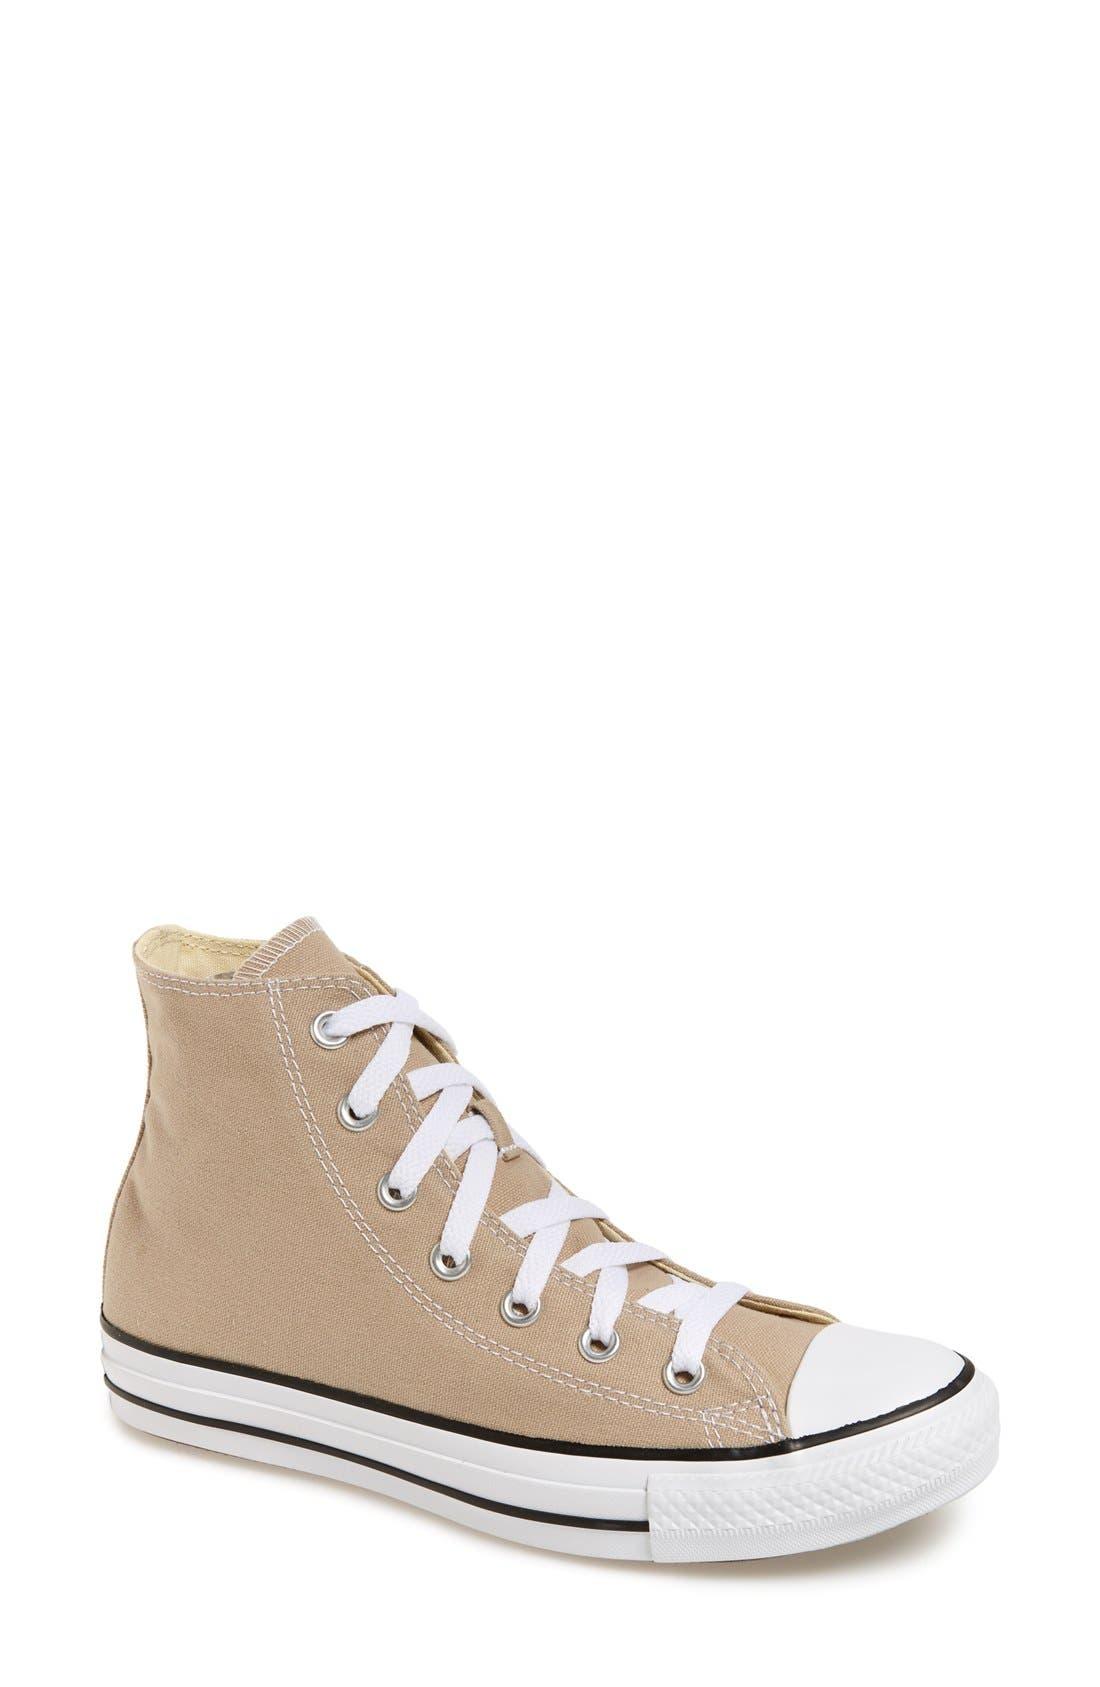 Main Image - Converse Chuck Taylor® All Star®' Seasonal' High Top Sneaker (Women)